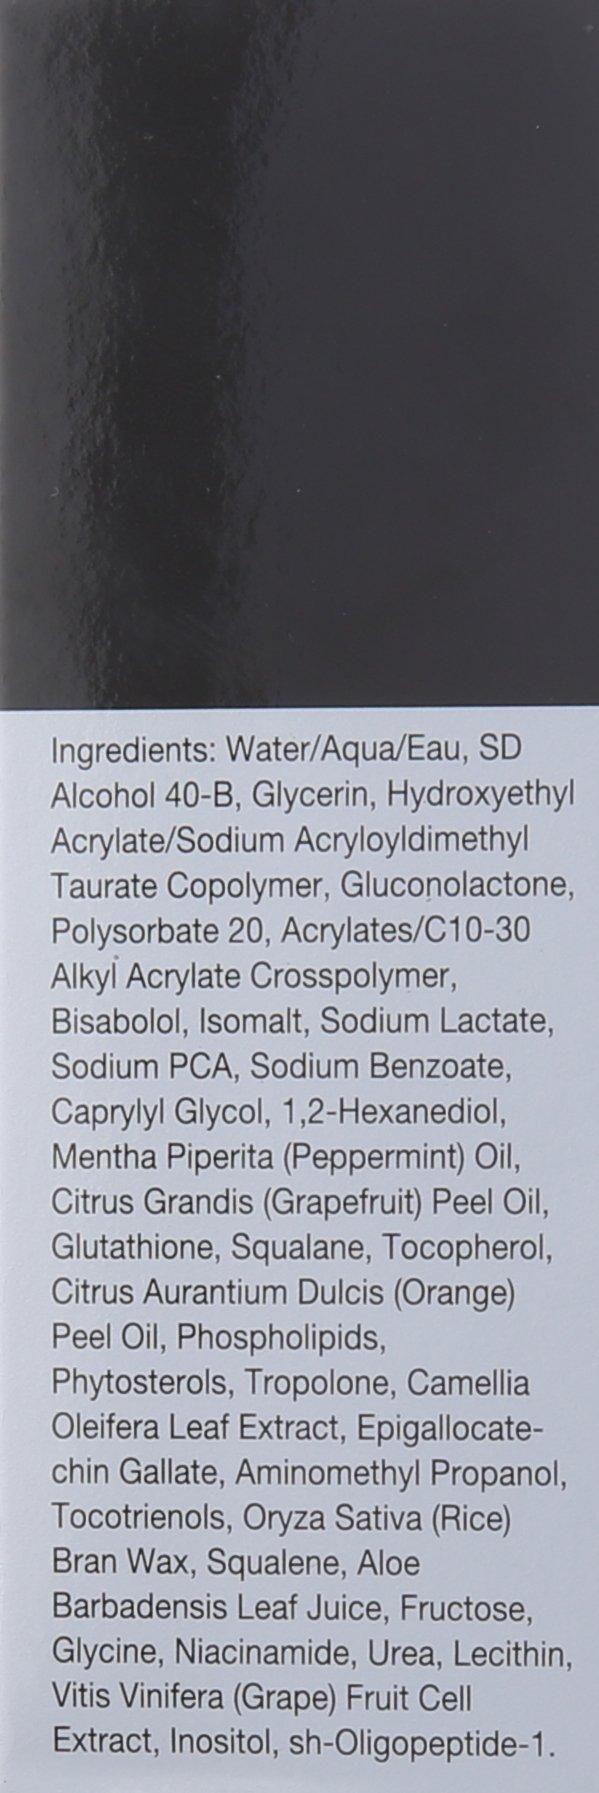 PCA SKIN Rejuvenating Serum, Antioxidant Age Prevention Skin Booster for All Skin Types, 1 fl. oz.